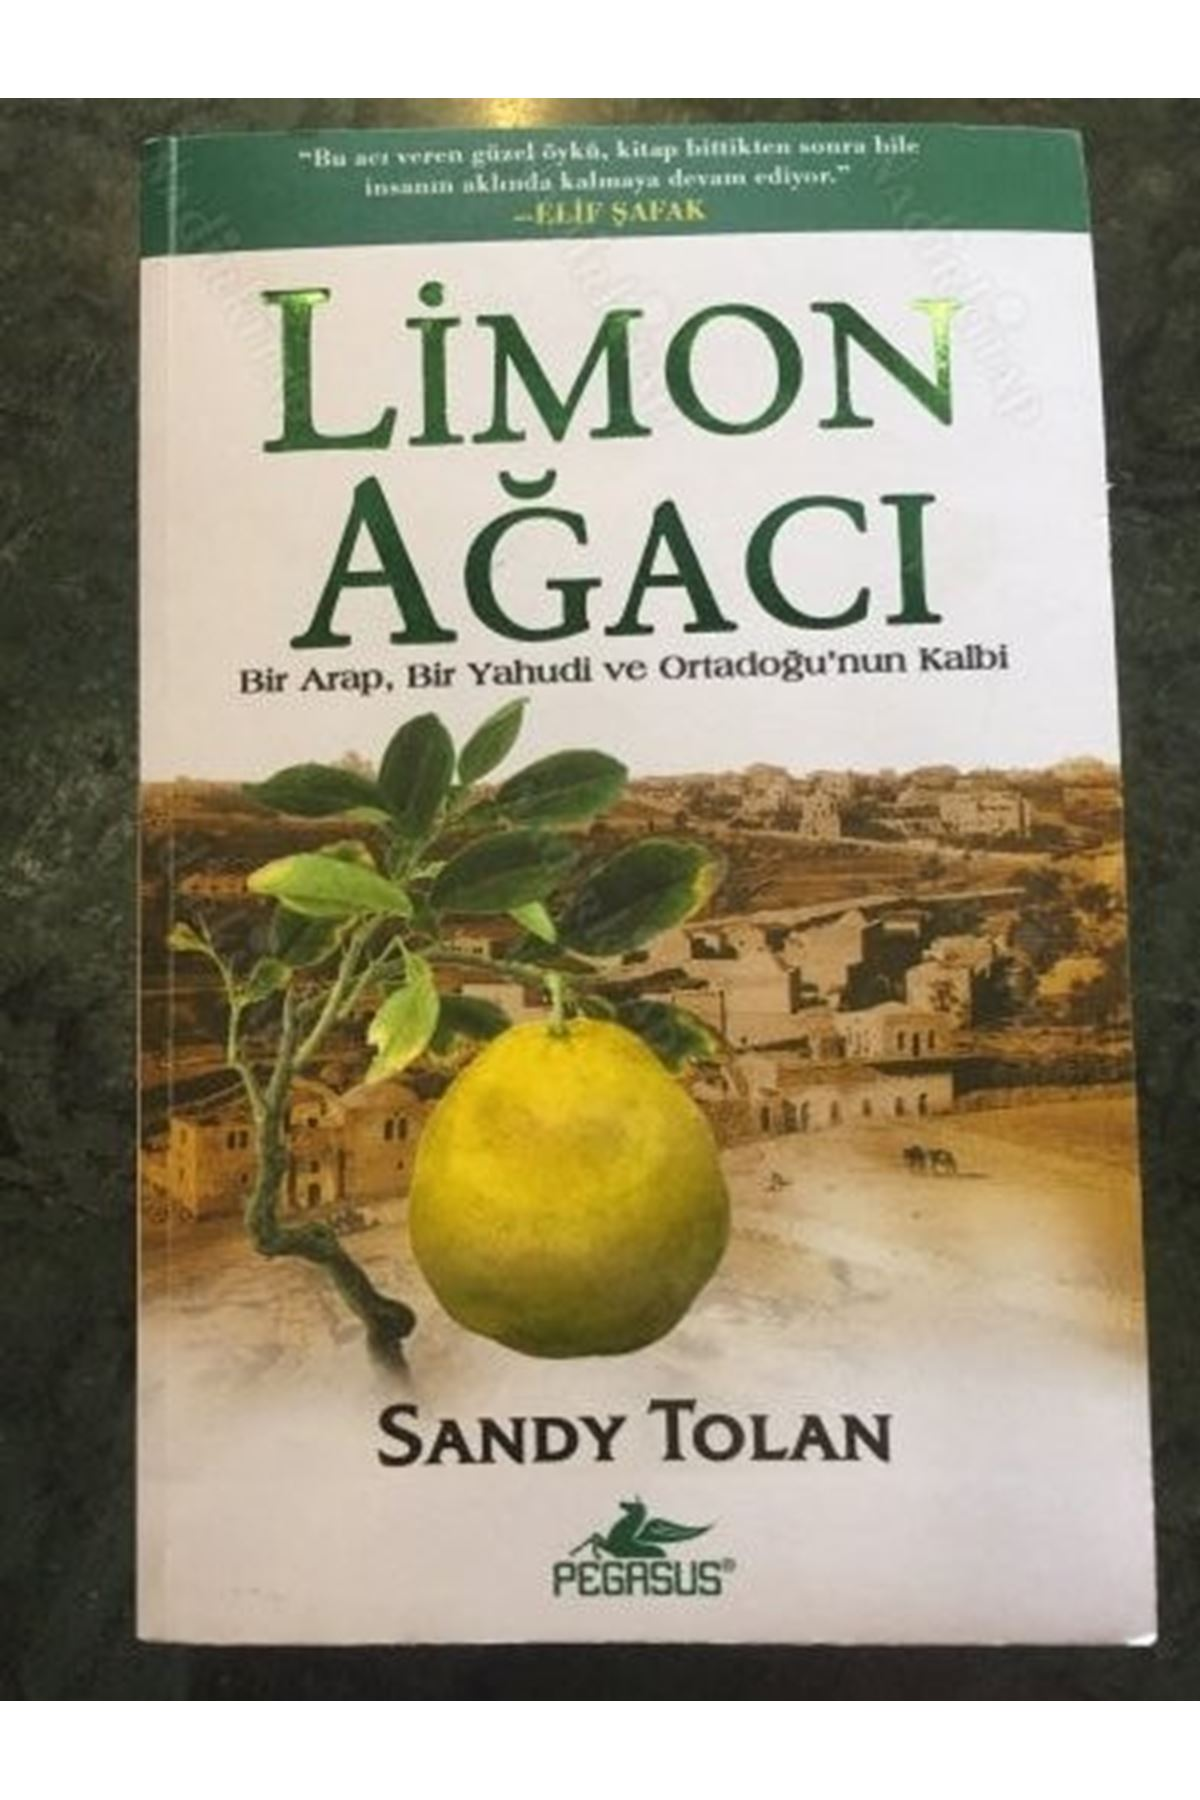 SANDY TOLAN - LİMON AĞACI